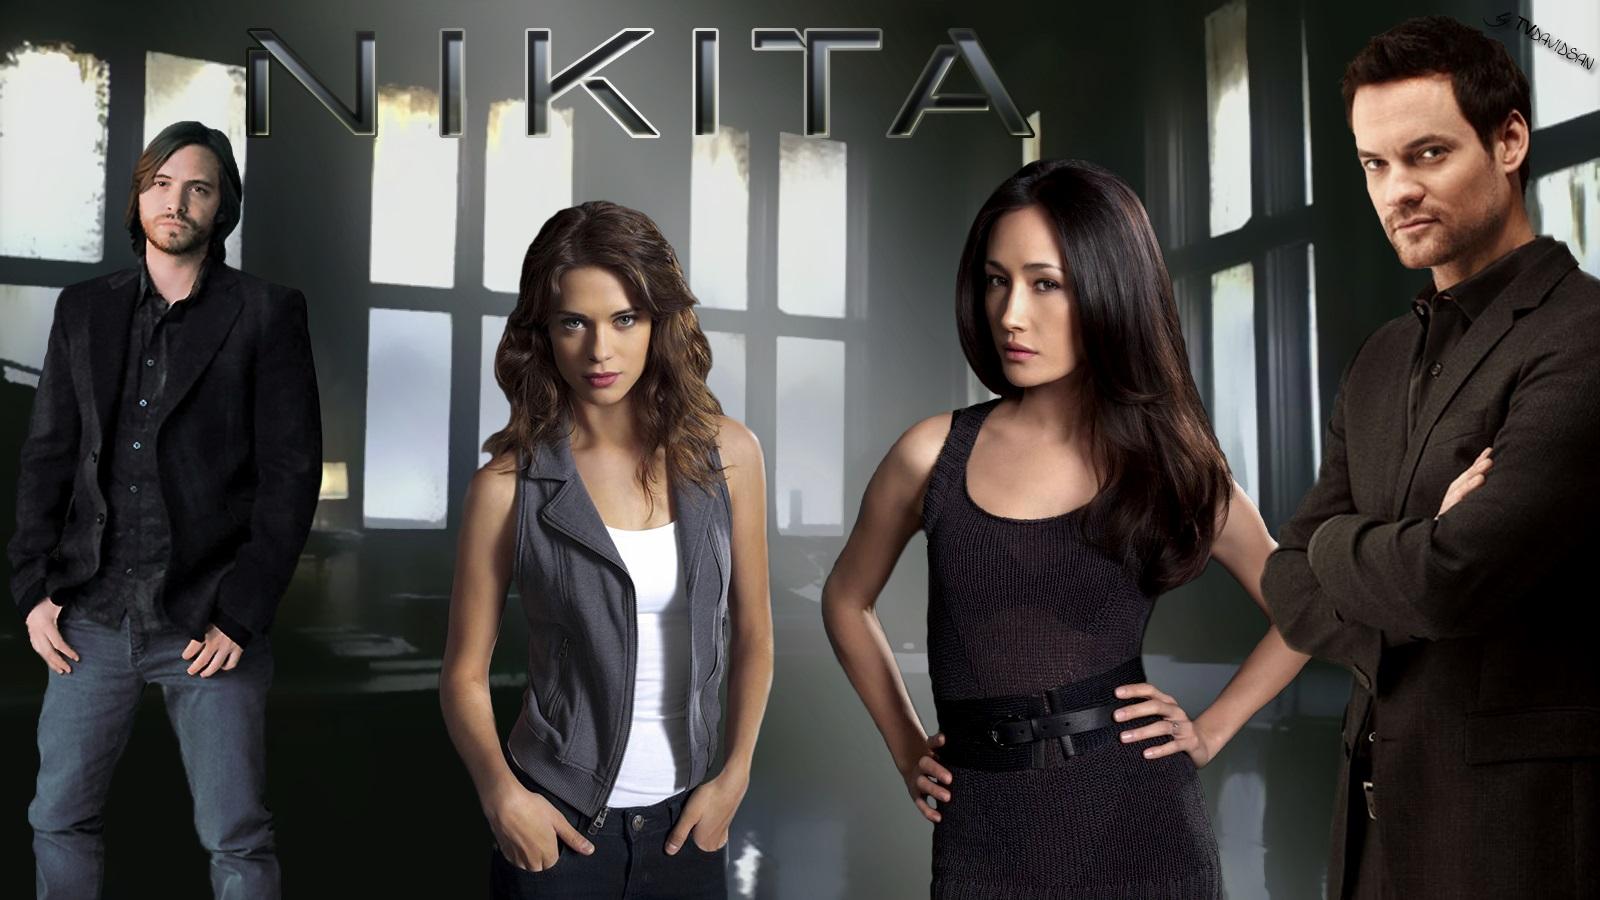 Nikita wallpaper 13